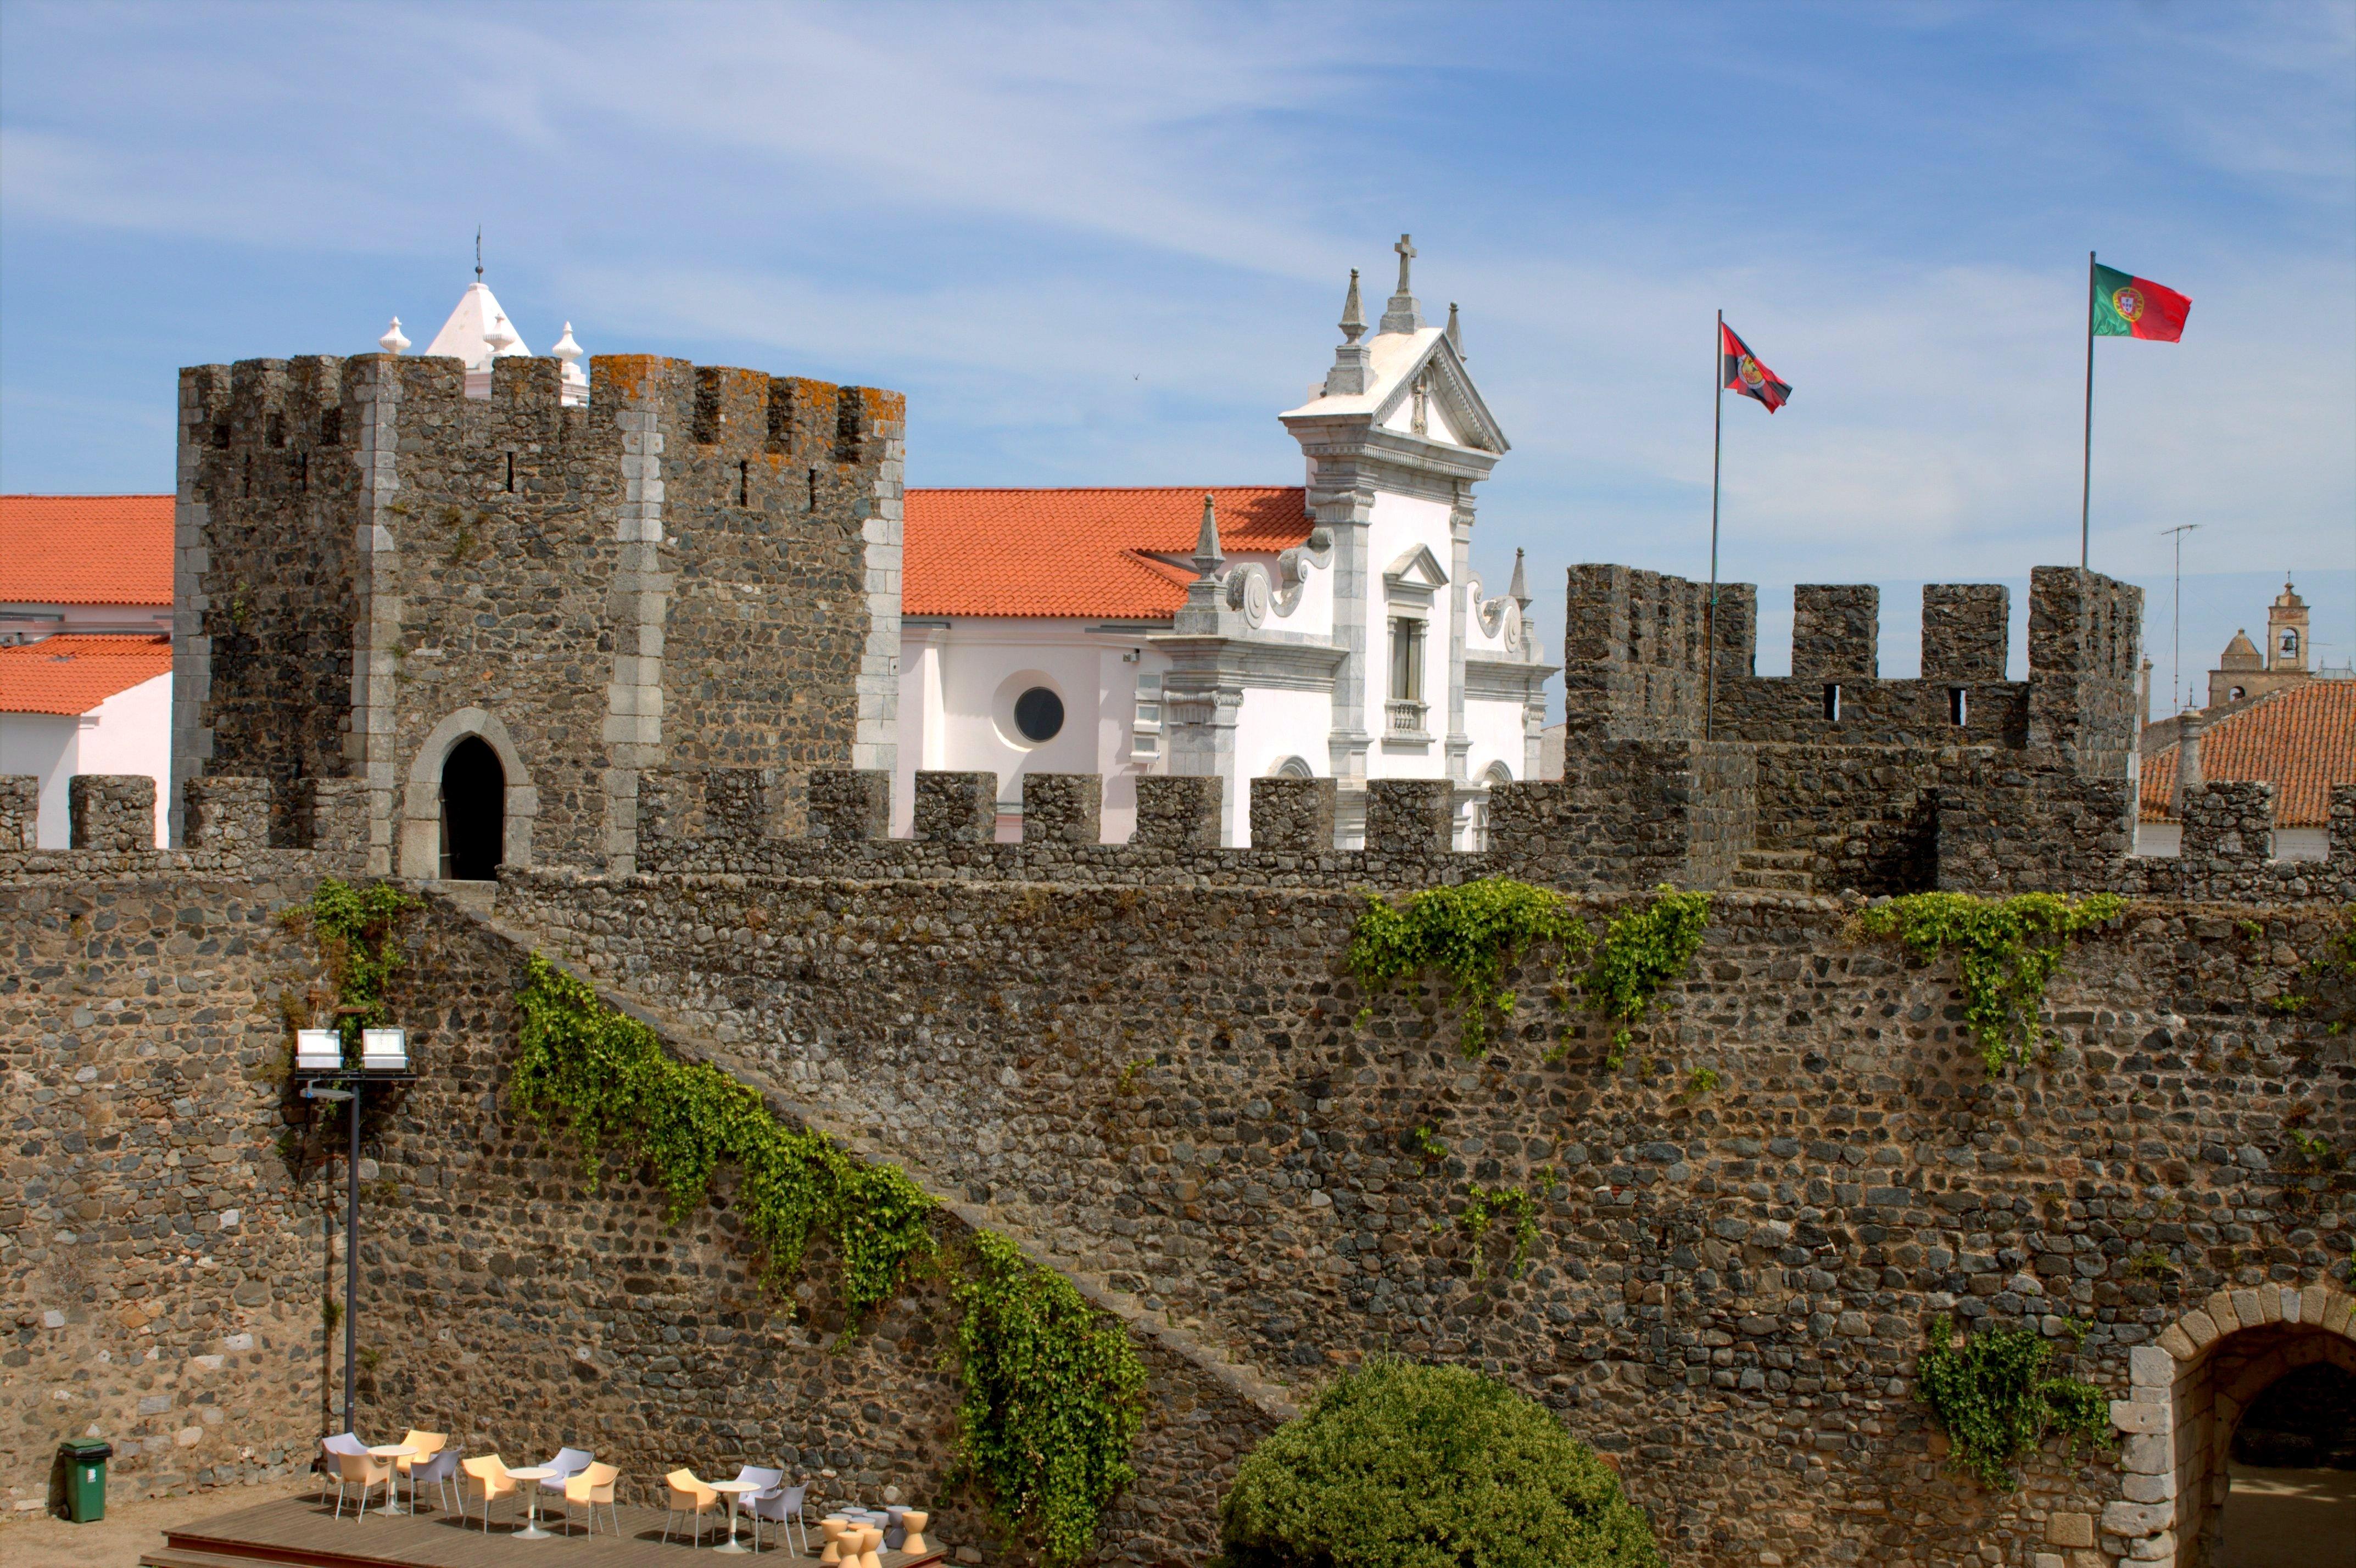 05. Beja Castle, Portugal